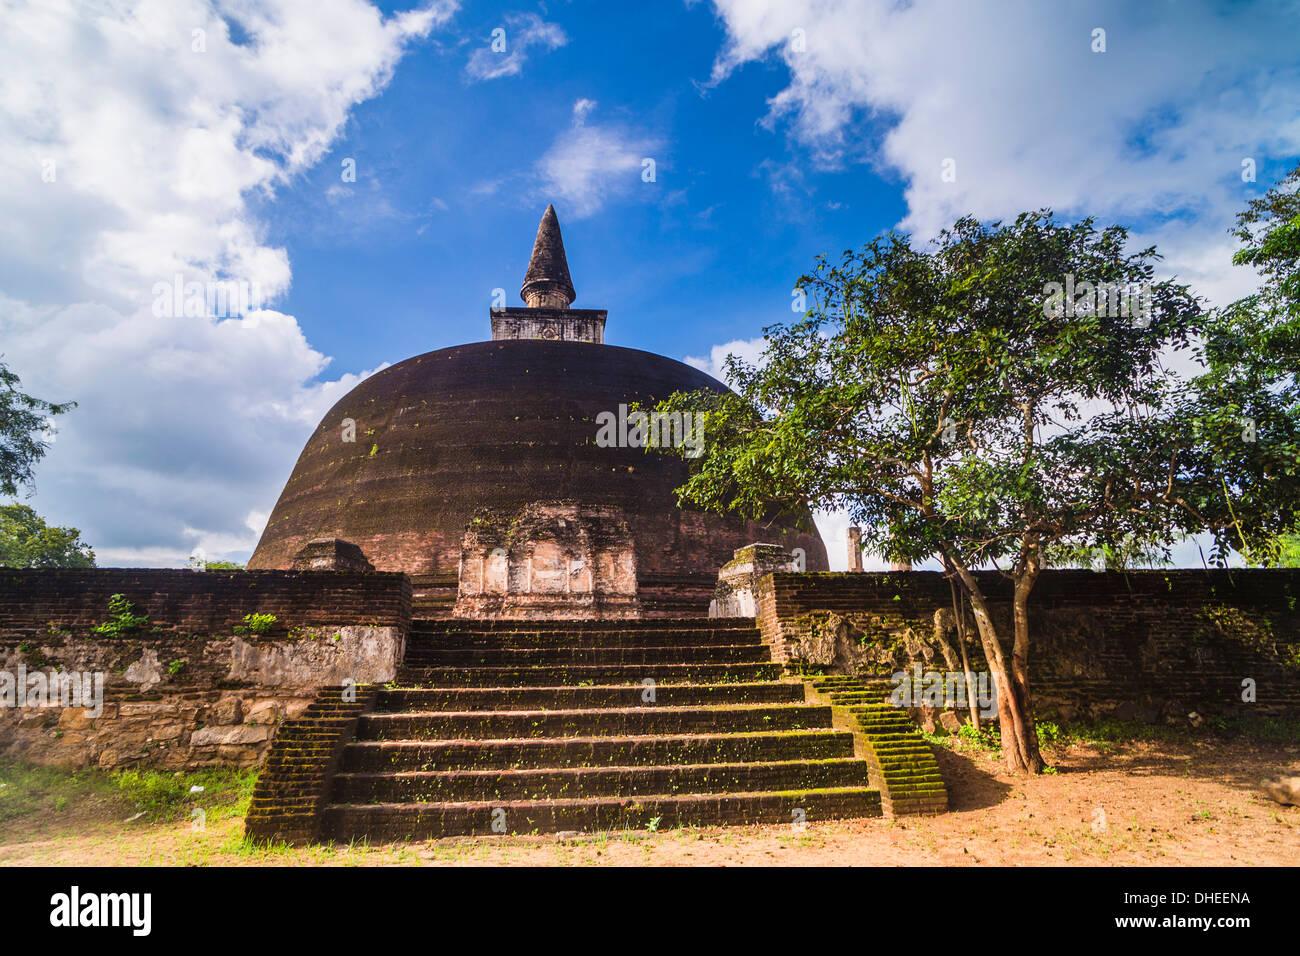 Rankot Vihara Dagoba, Polonnaruwa, Site du patrimoine mondial de l'UNESCO, le Sri Lanka, l'Asie Photo Stock